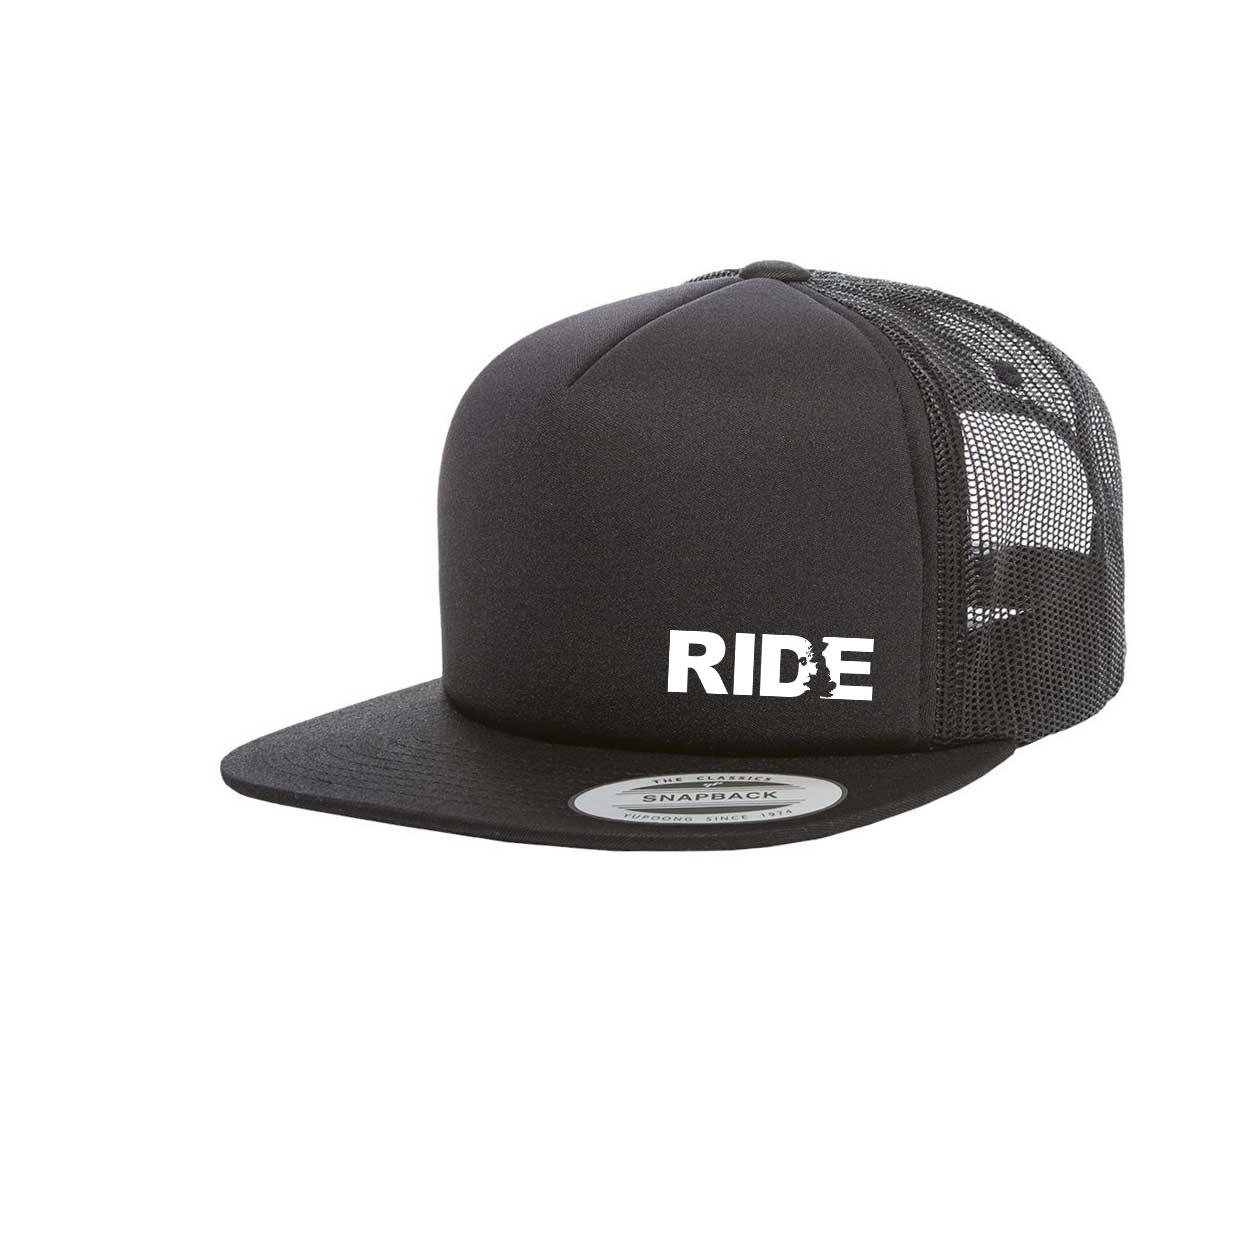 Ride United Kingdom Night Out Premium Foam Flat Brim Snapback Hat Black (White Logo)